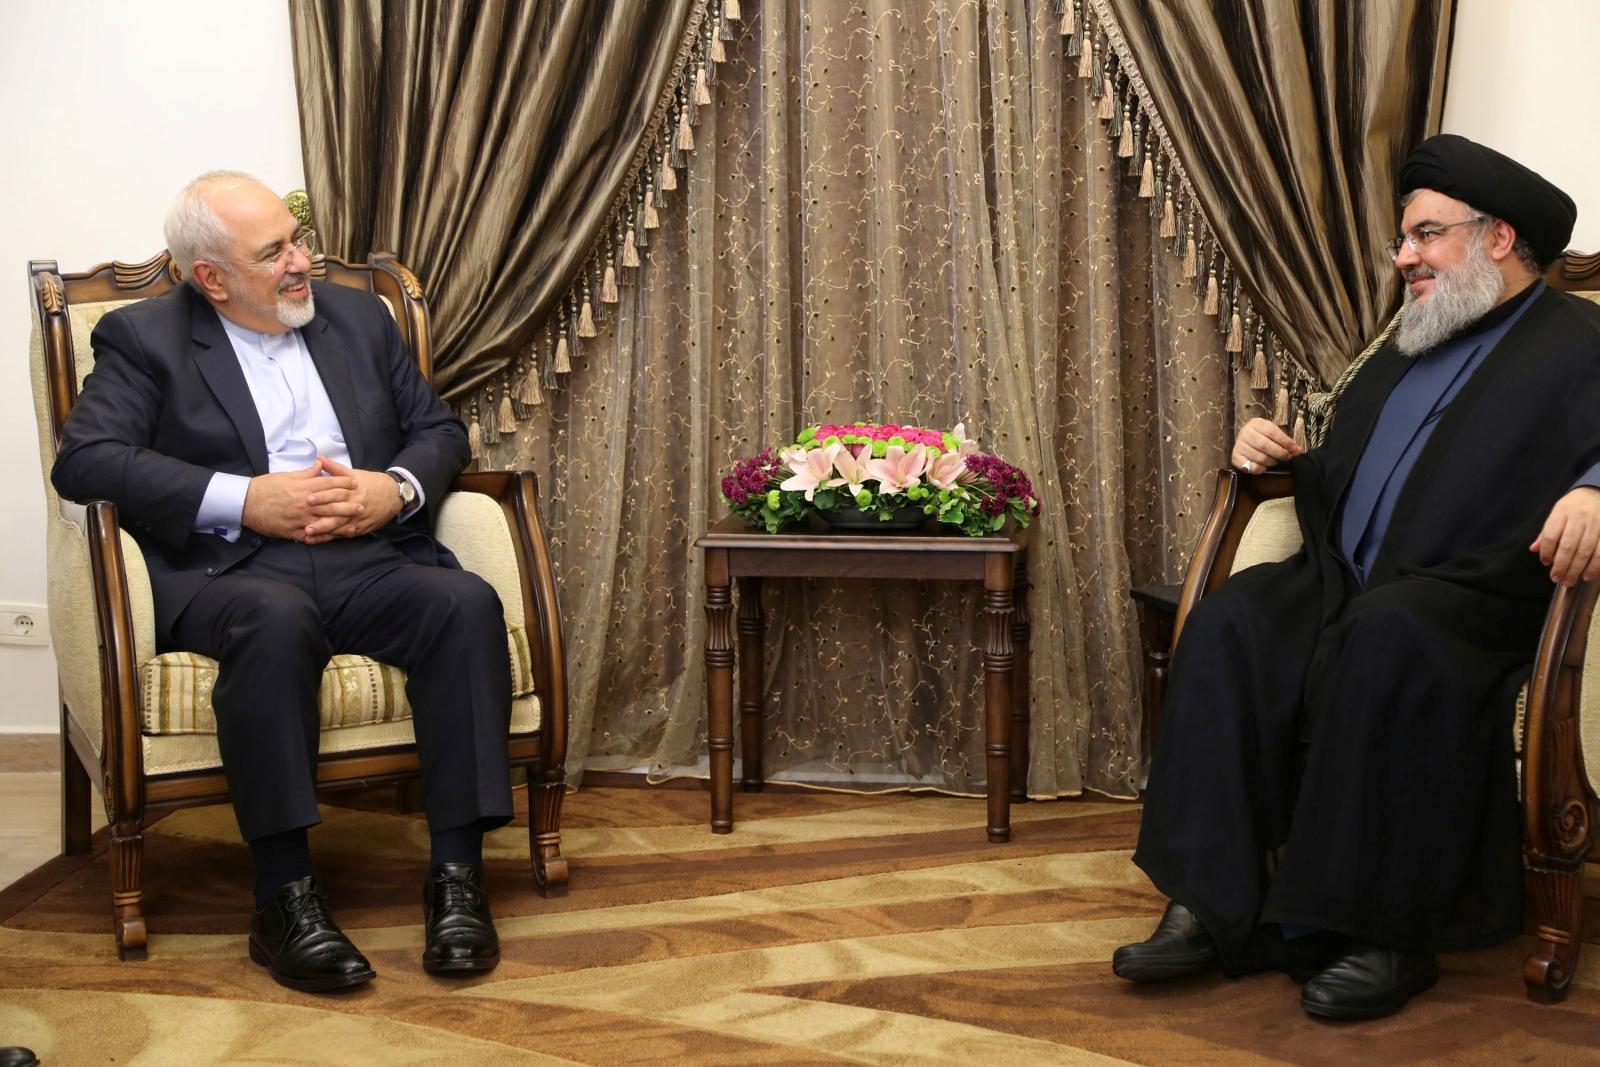 Lebanon's Hezbollah leader Sayyed Hassan Nasrallah